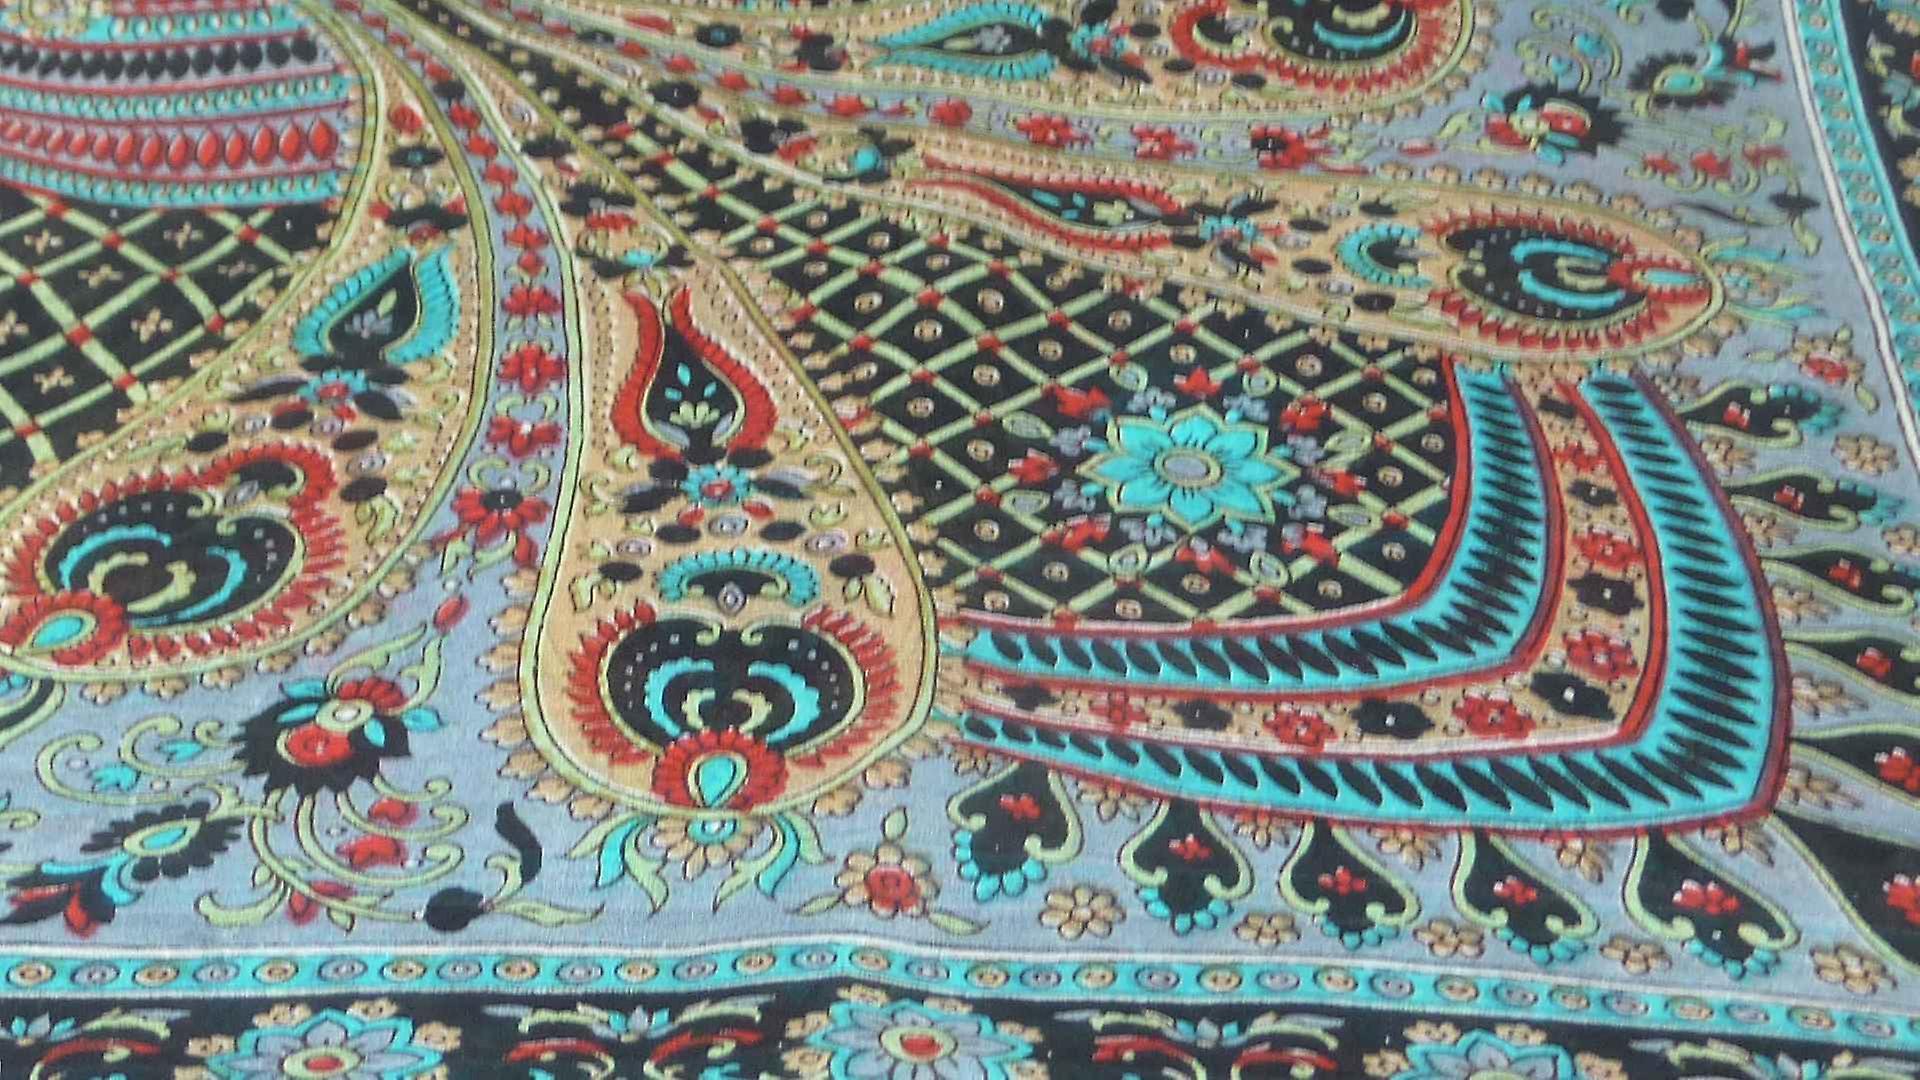 Mulberry Silk Traditional Square Scarf Zamjeet Black by Pashmina & Silk